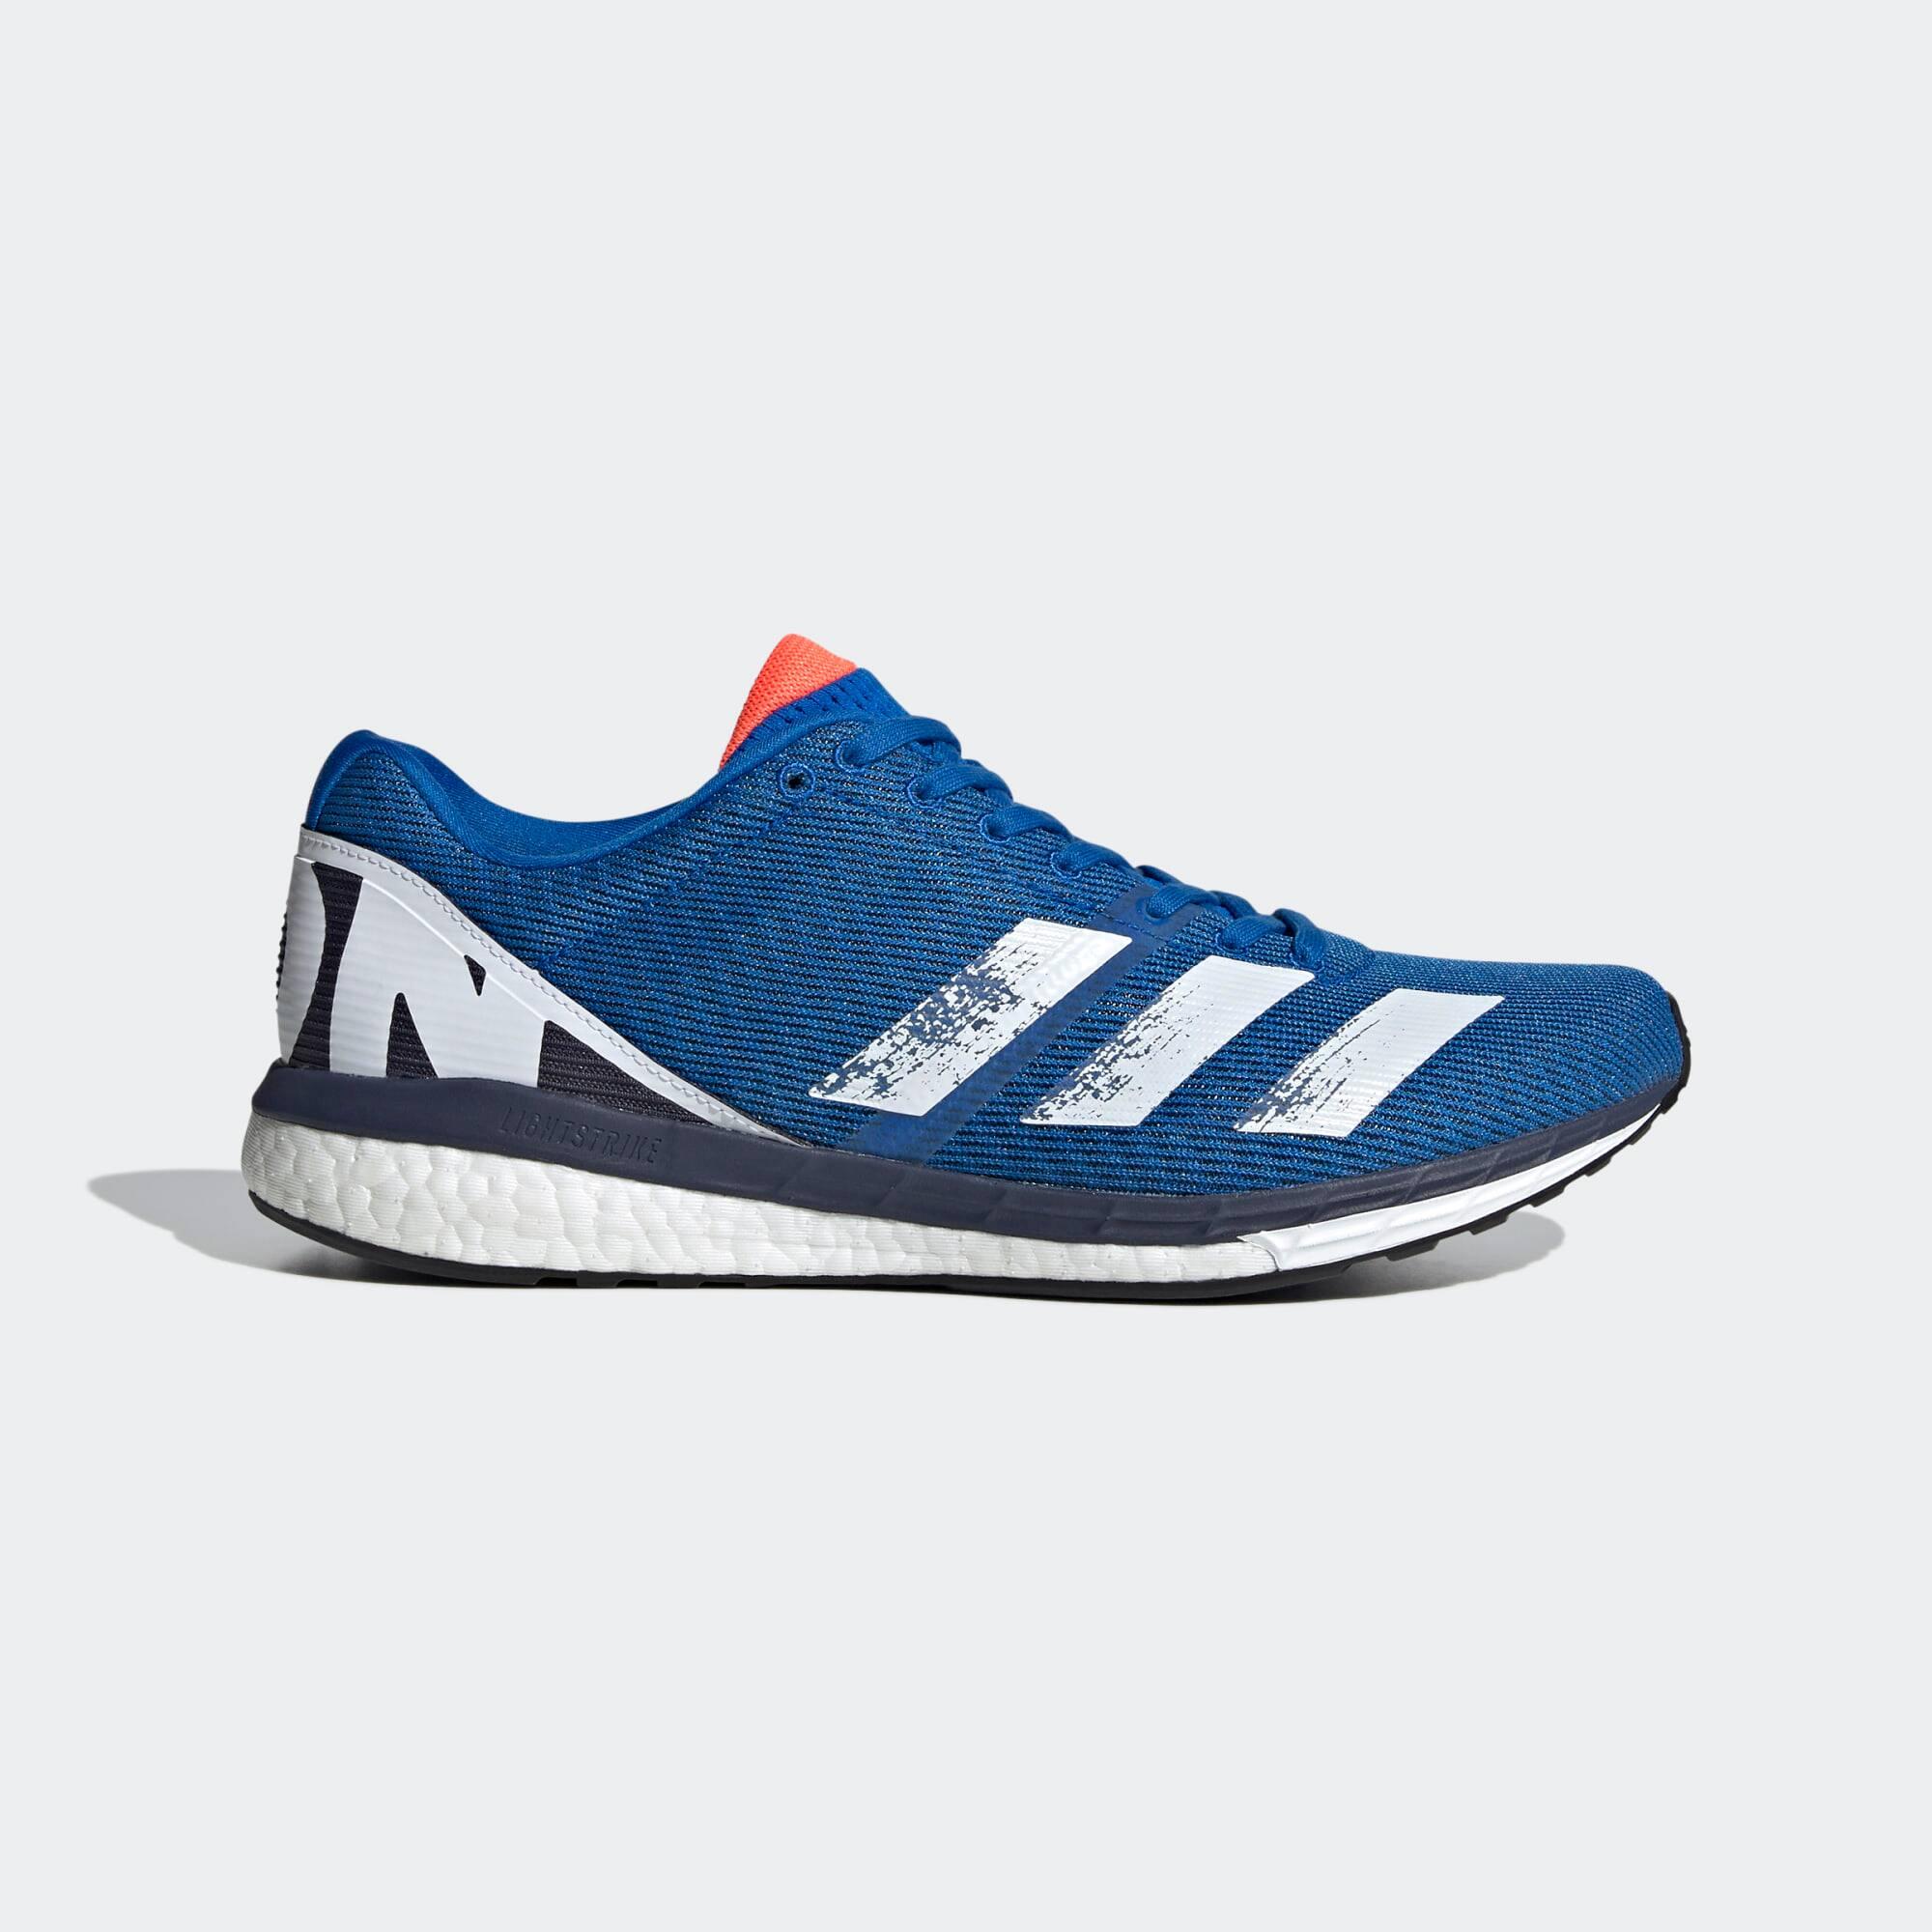 adidas Men's Adizero Boston 8 Running Shoes (blue/white)